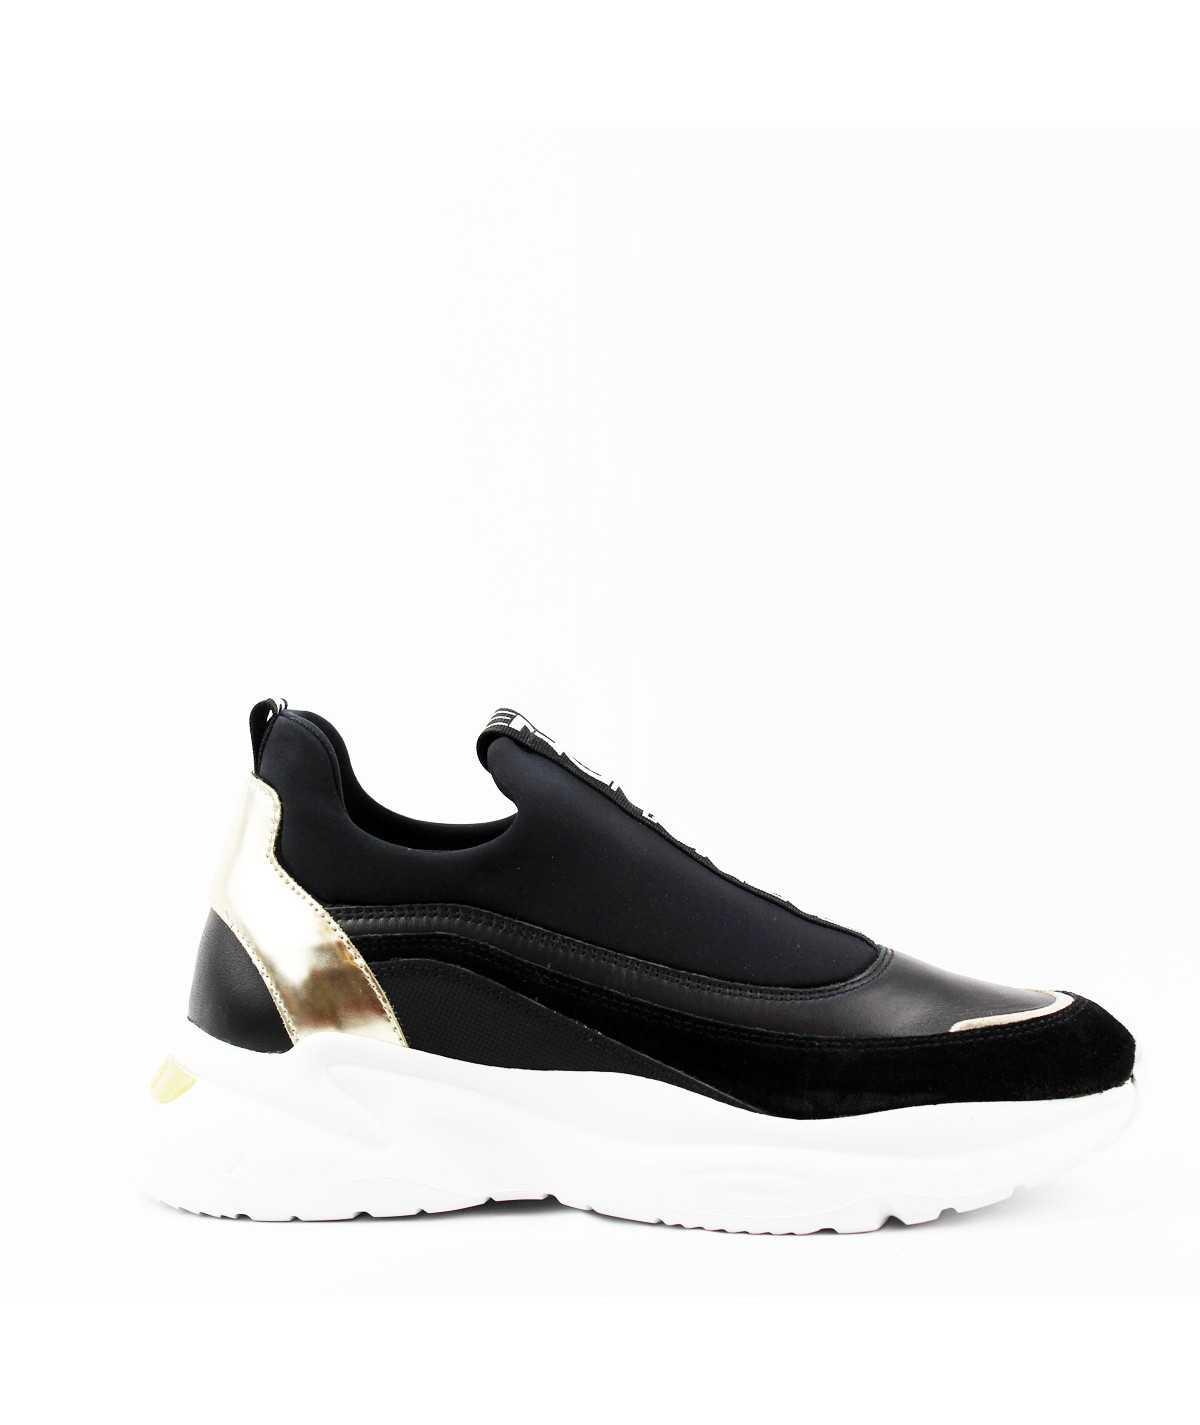 ENGI NEROGIARDINI Sneakers